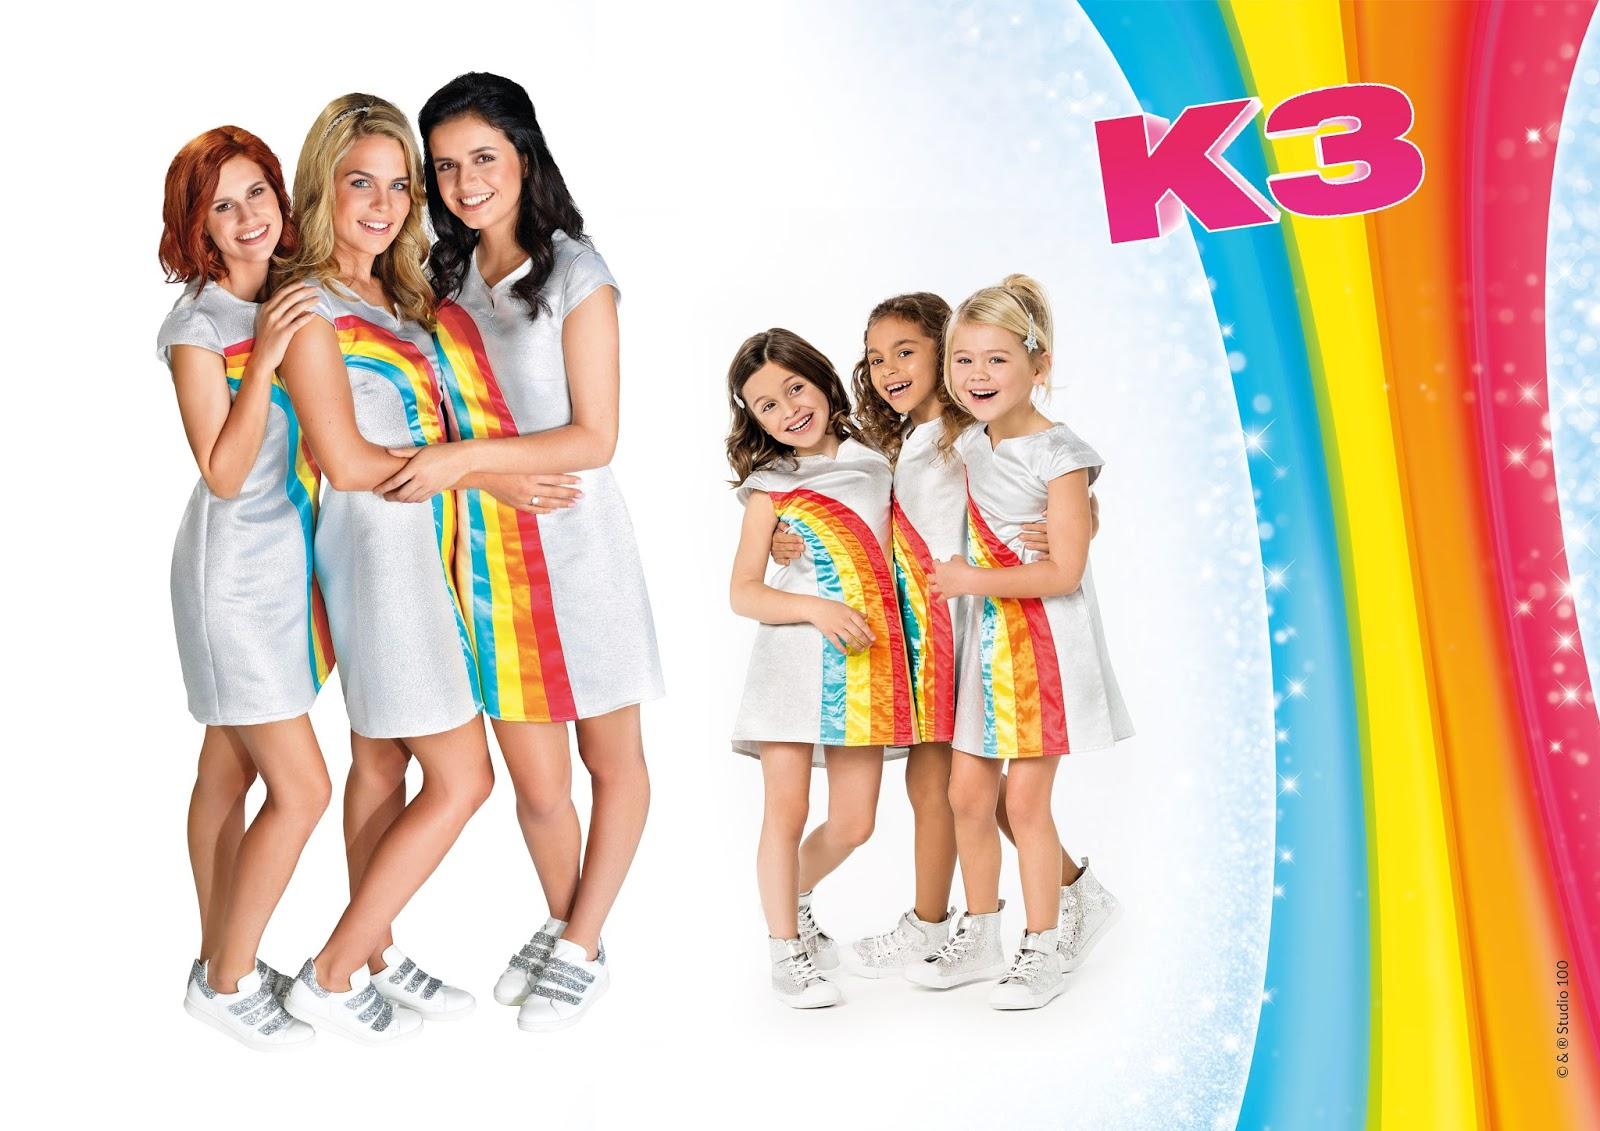 k3 regenboog